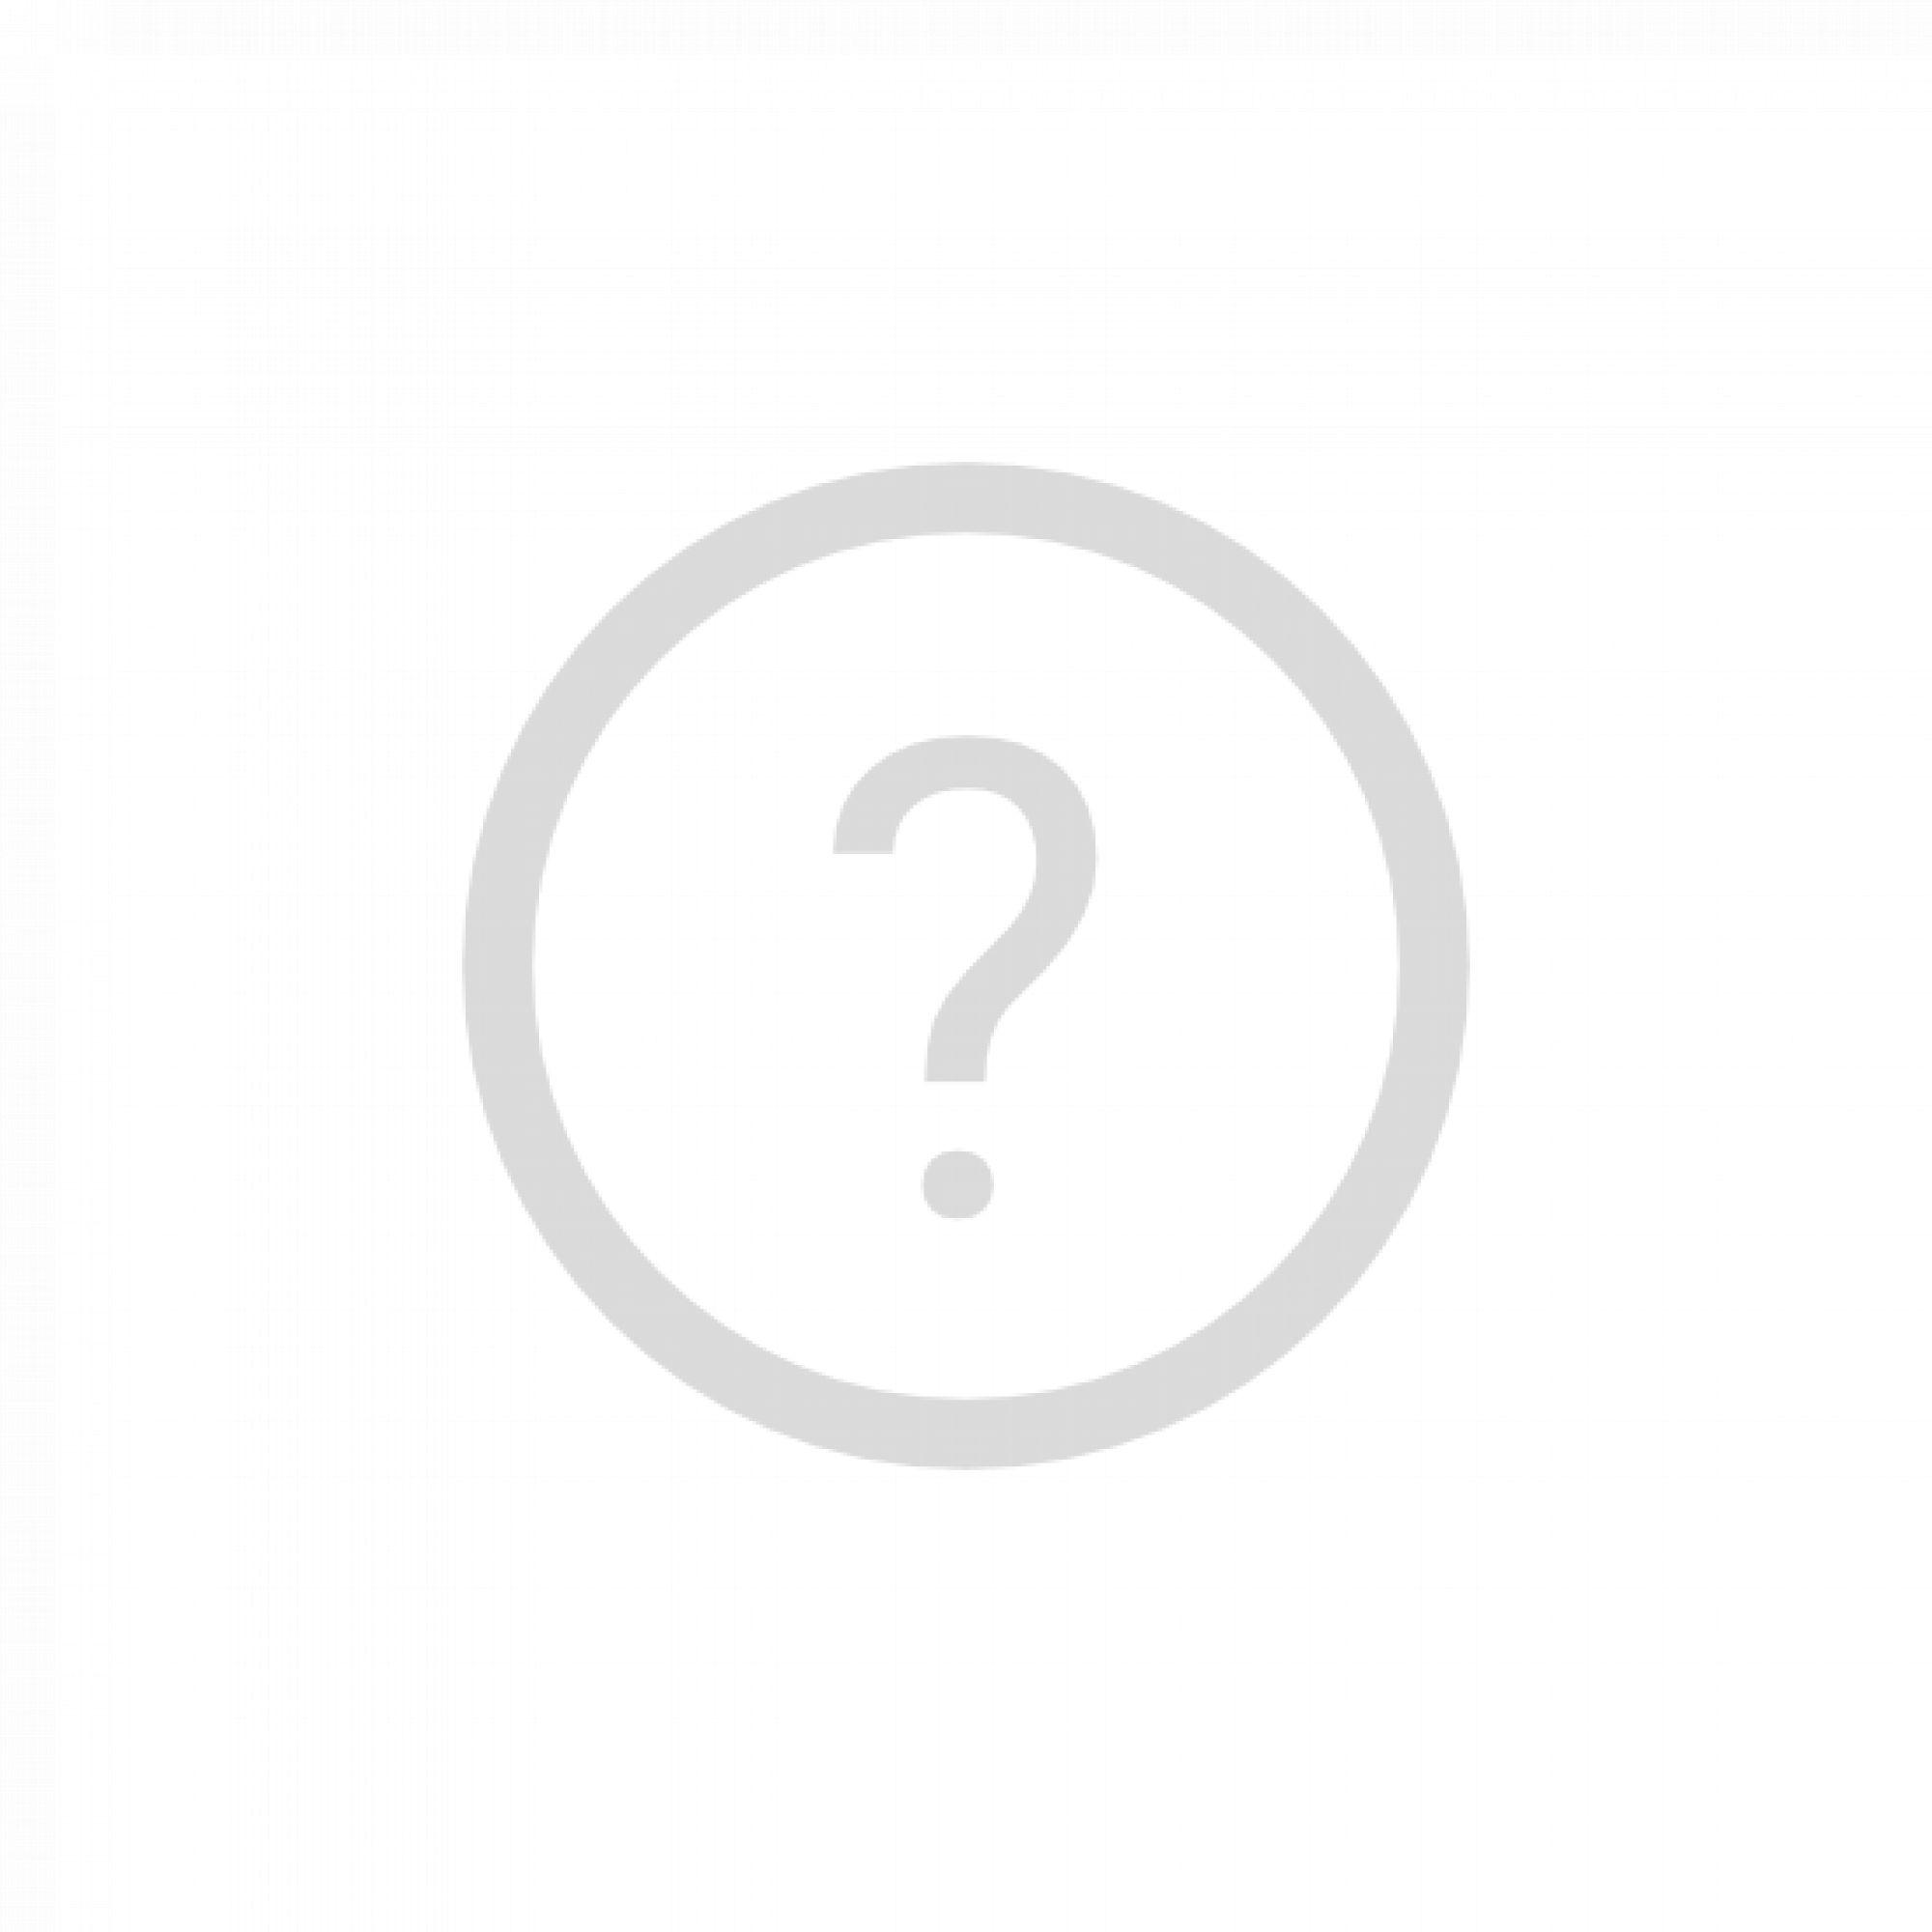 oxigin 18 concave felgen black foil red felgenbett logo. Black Bedroom Furniture Sets. Home Design Ideas